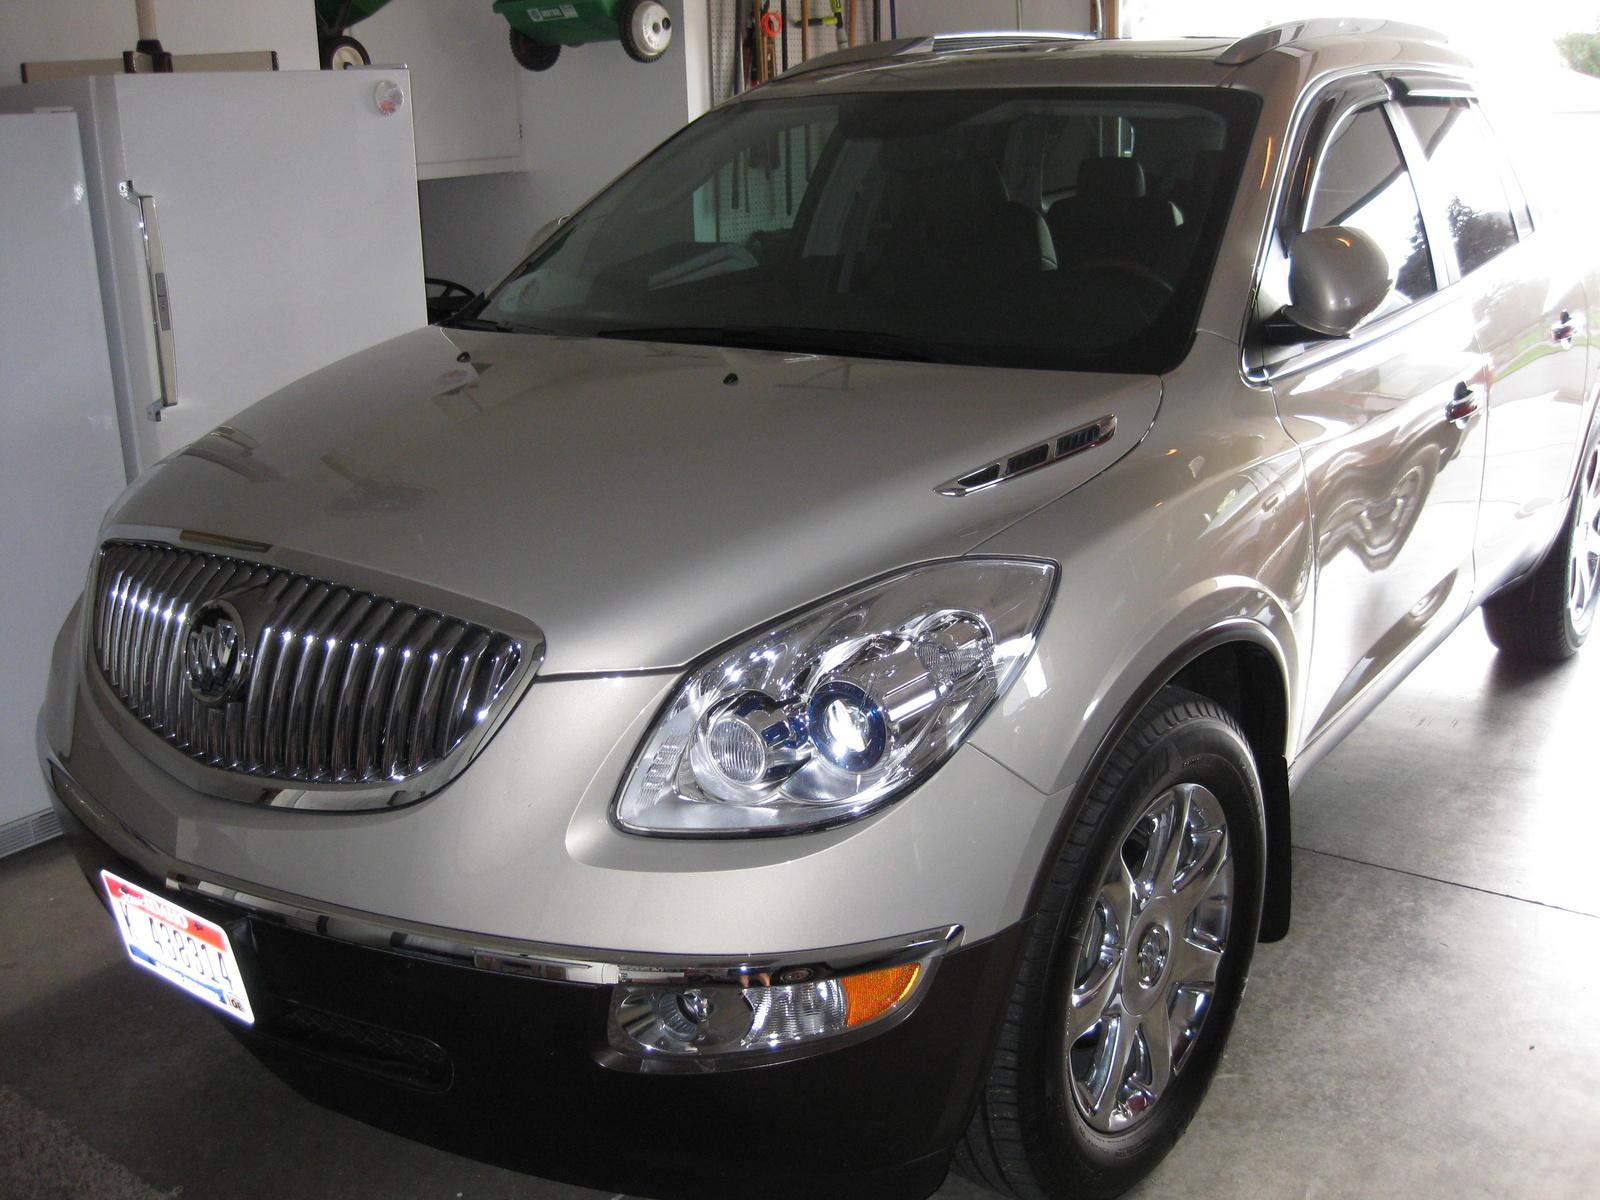 Buick Enclave Cx Cxl V6 Awd Reviews Specs Pictures Prices | Auto ...